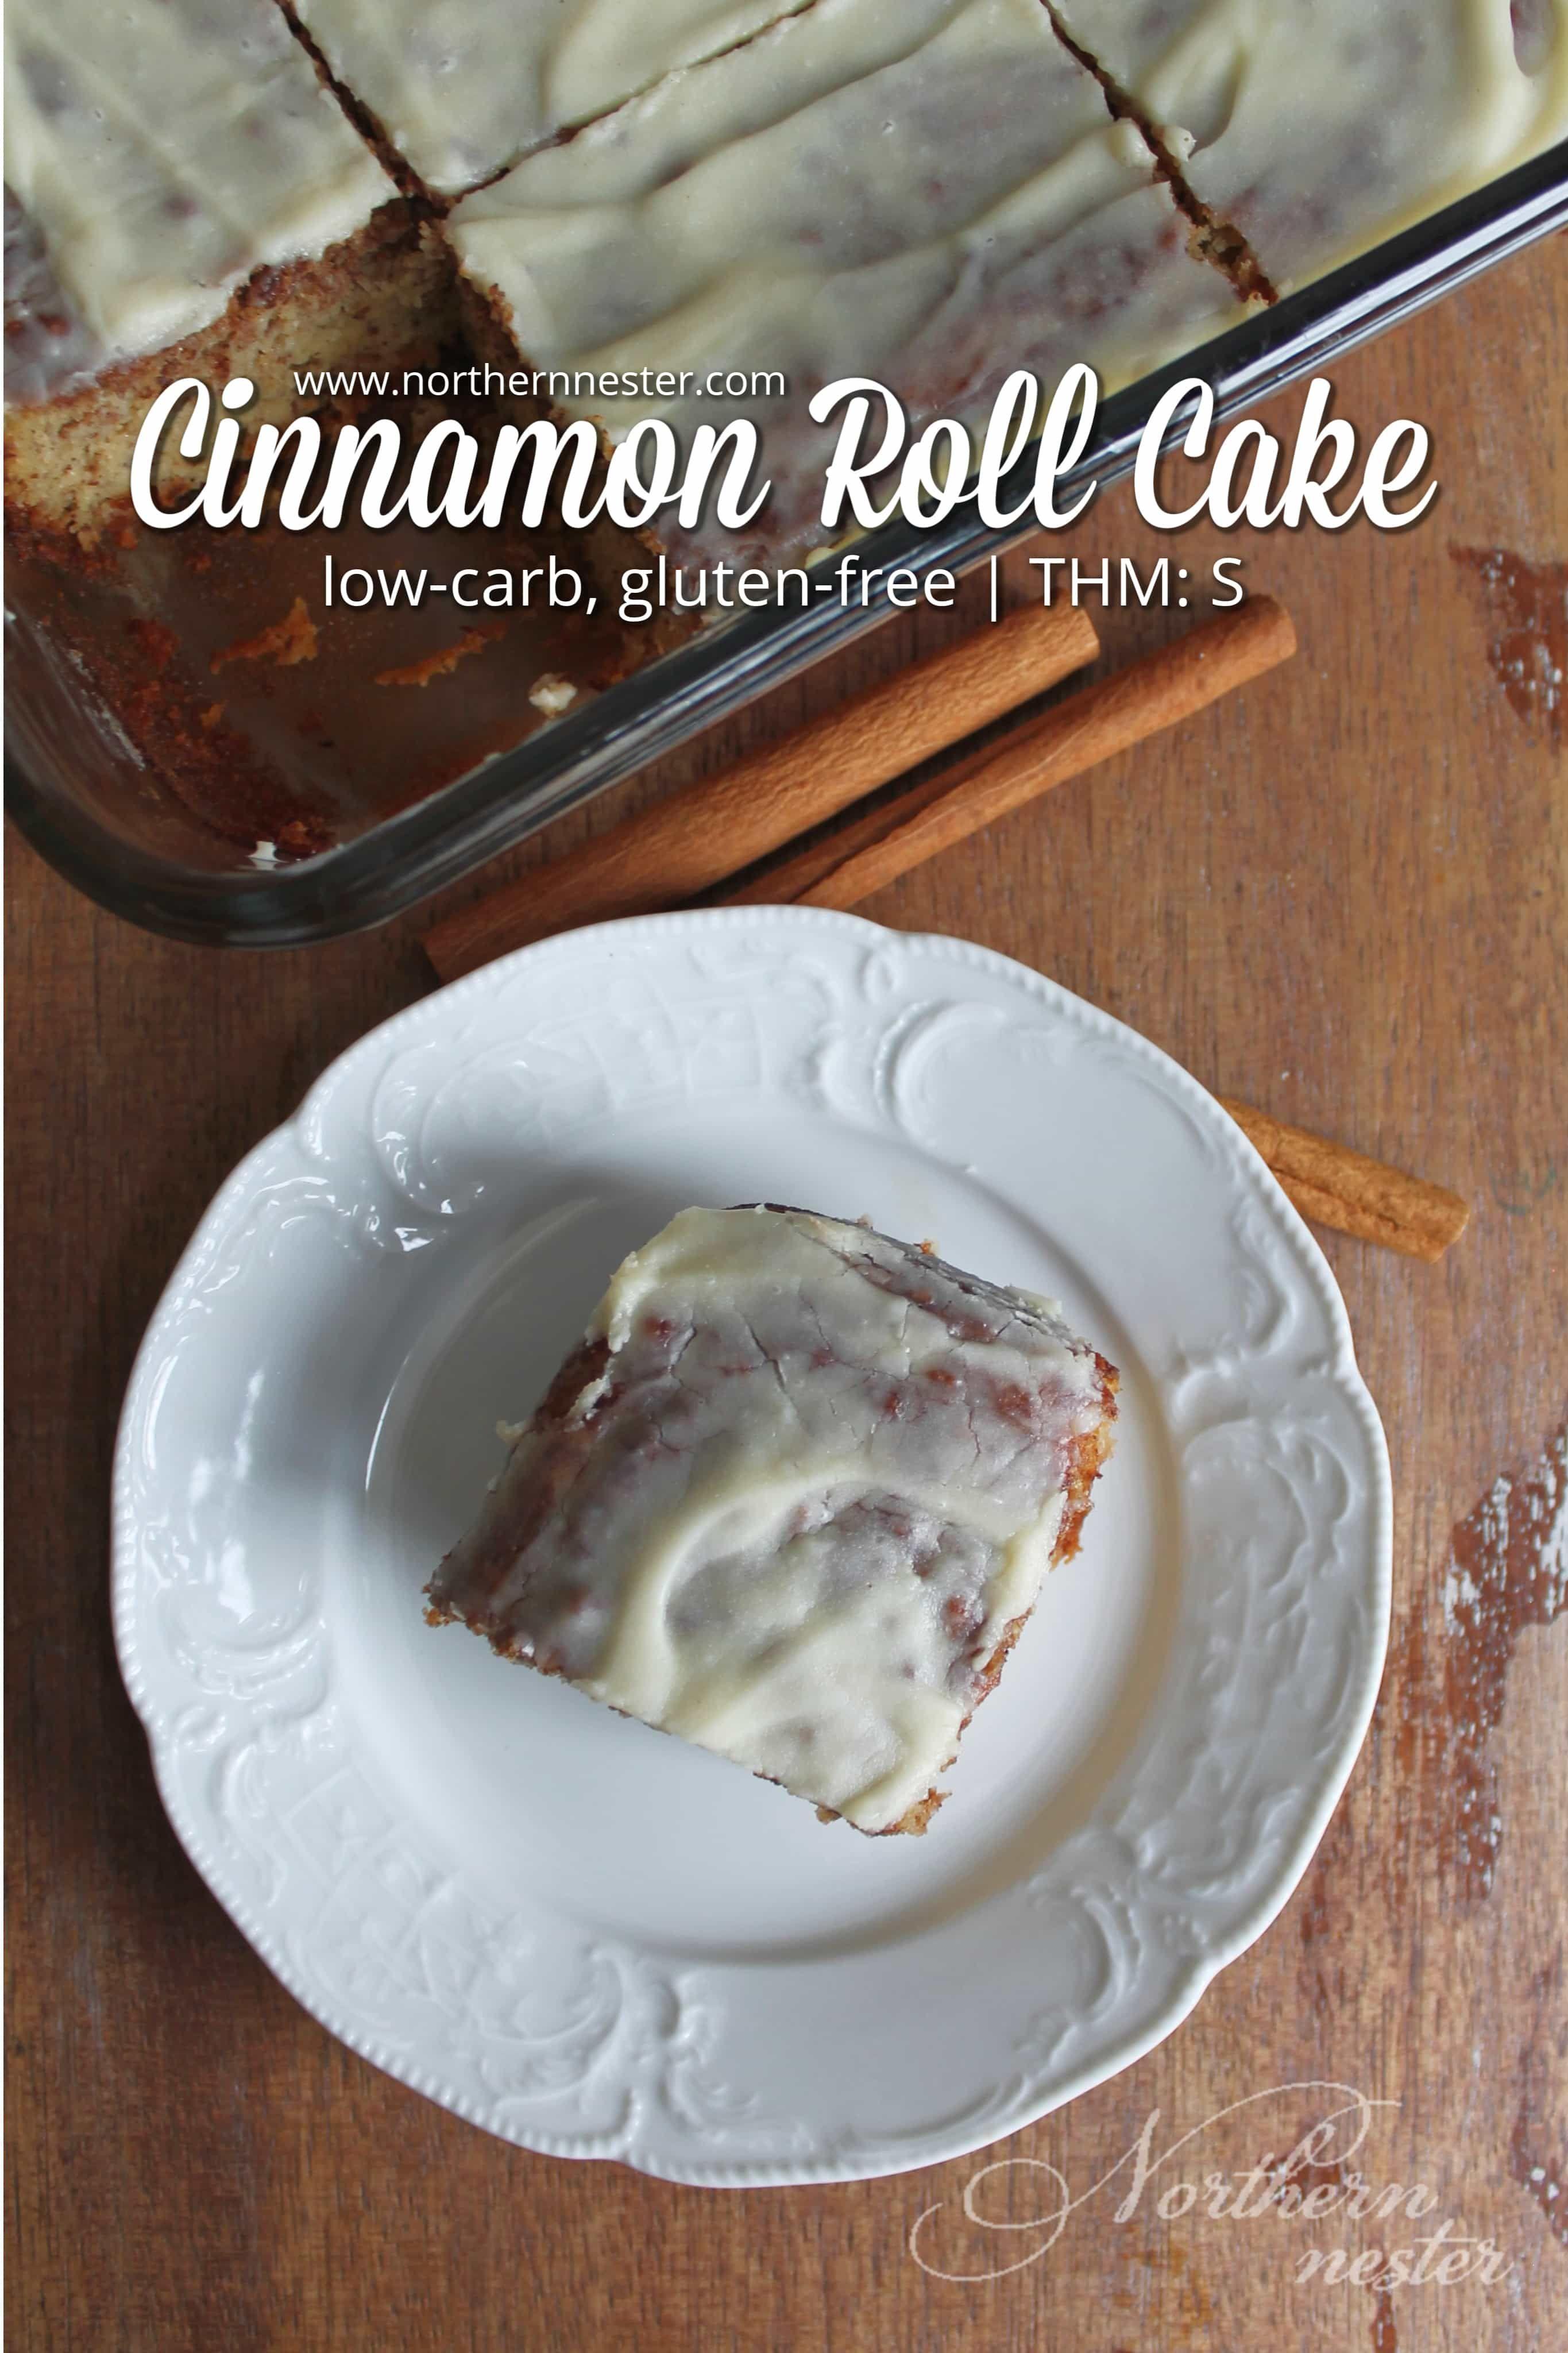 Cinnamon Roll Cake | THM: S, Low-Carb, Gluten-Free #rollcake